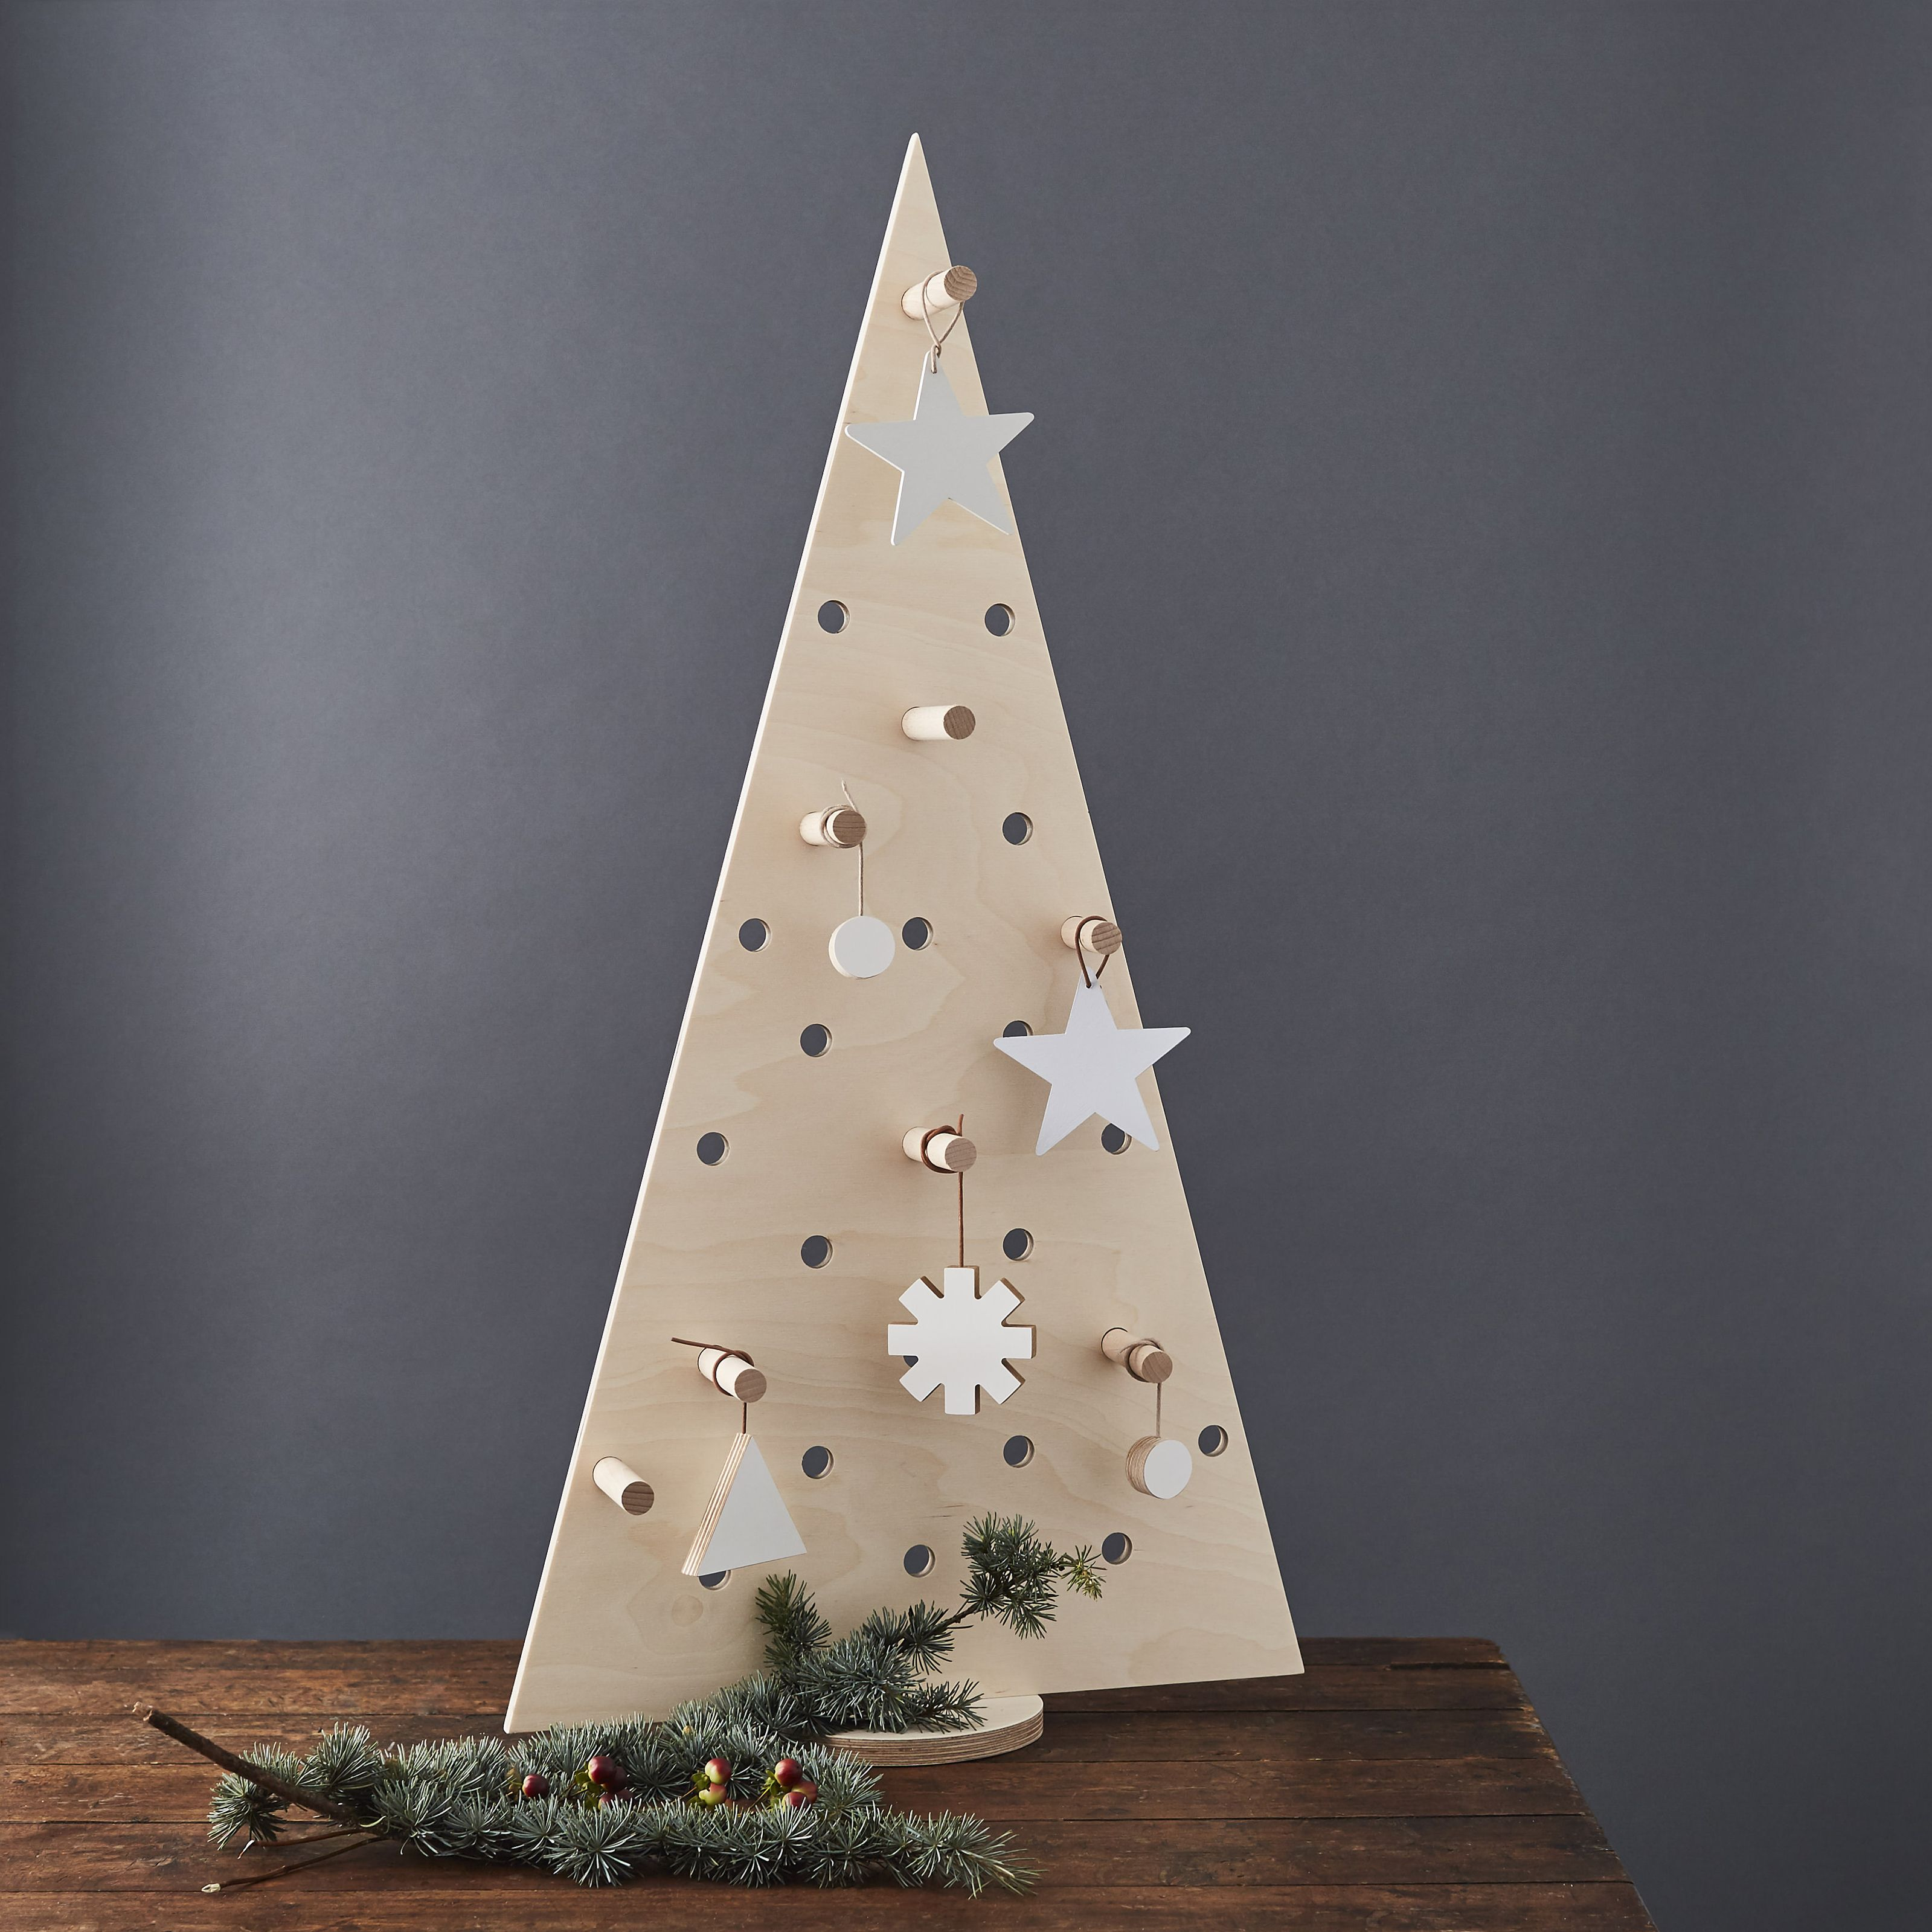 Christmas Tree Pegboard Made From Birch Plywood It Comes With A Selection Of Pegs To Ideas De Arboles Navidenos Arbol Navideno De Madera Artesanias Navidenas